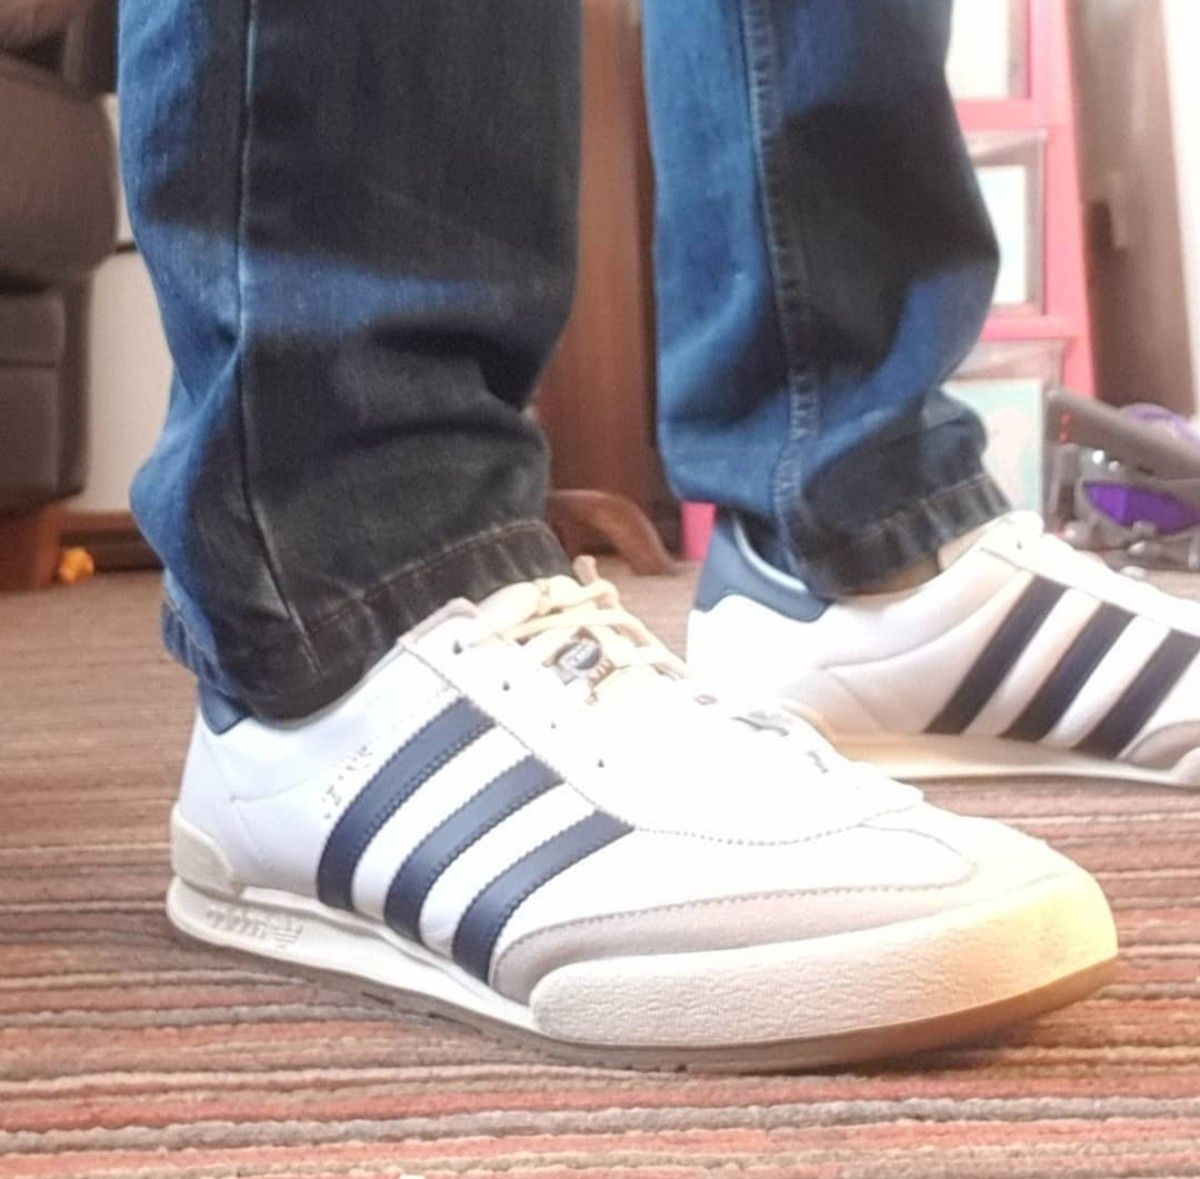 Adidas samba sneakers, Football casuals